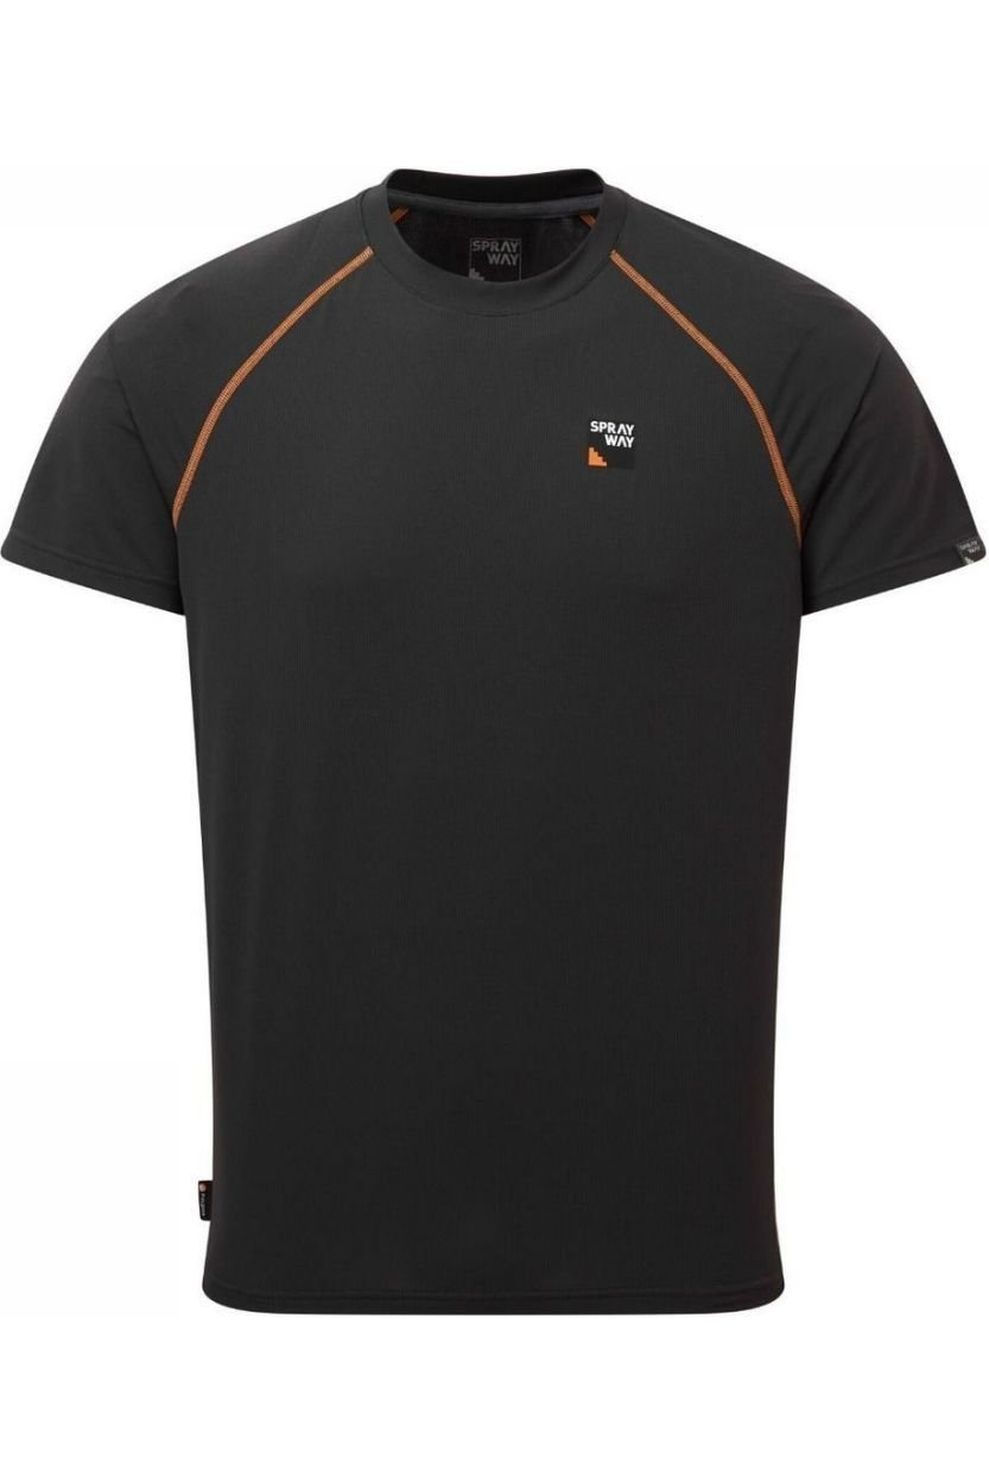 Sprayway T-Shirt Tech voor heren - Grijs - Maten: S, M, L, XL, XXL